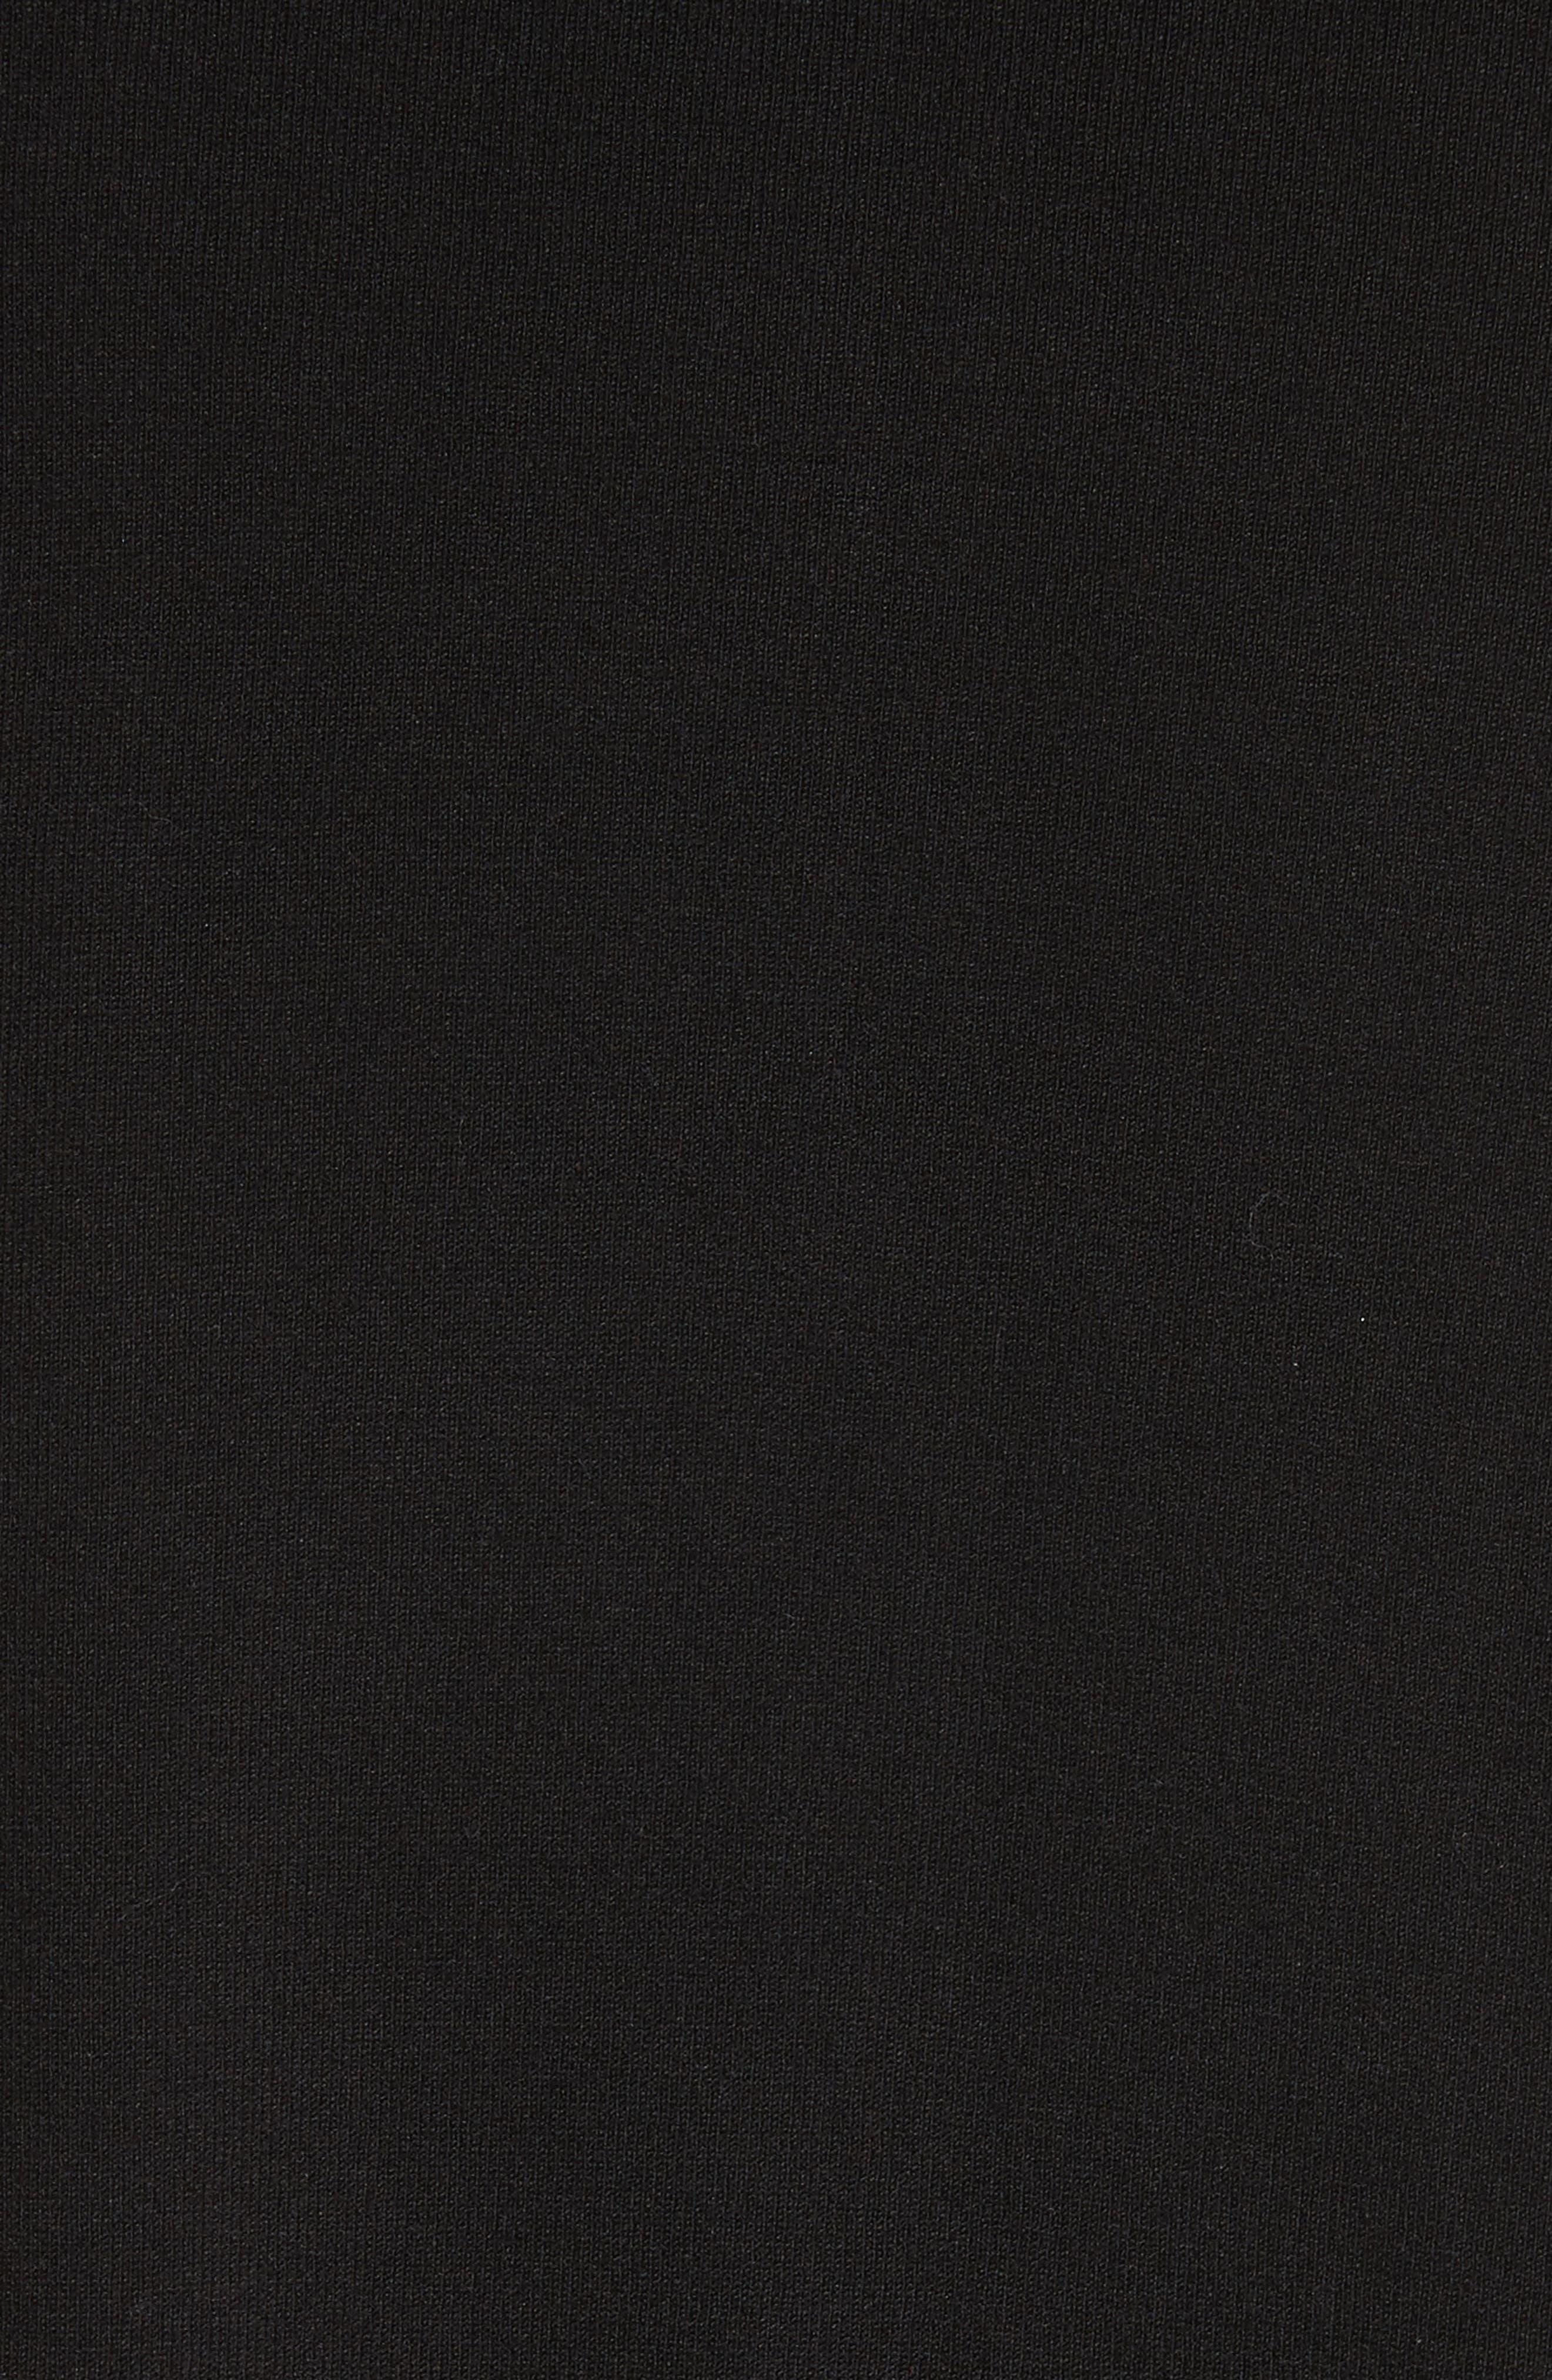 Maglia Tricot Cardigan,                             Alternate thumbnail 5, color,                             BLACK